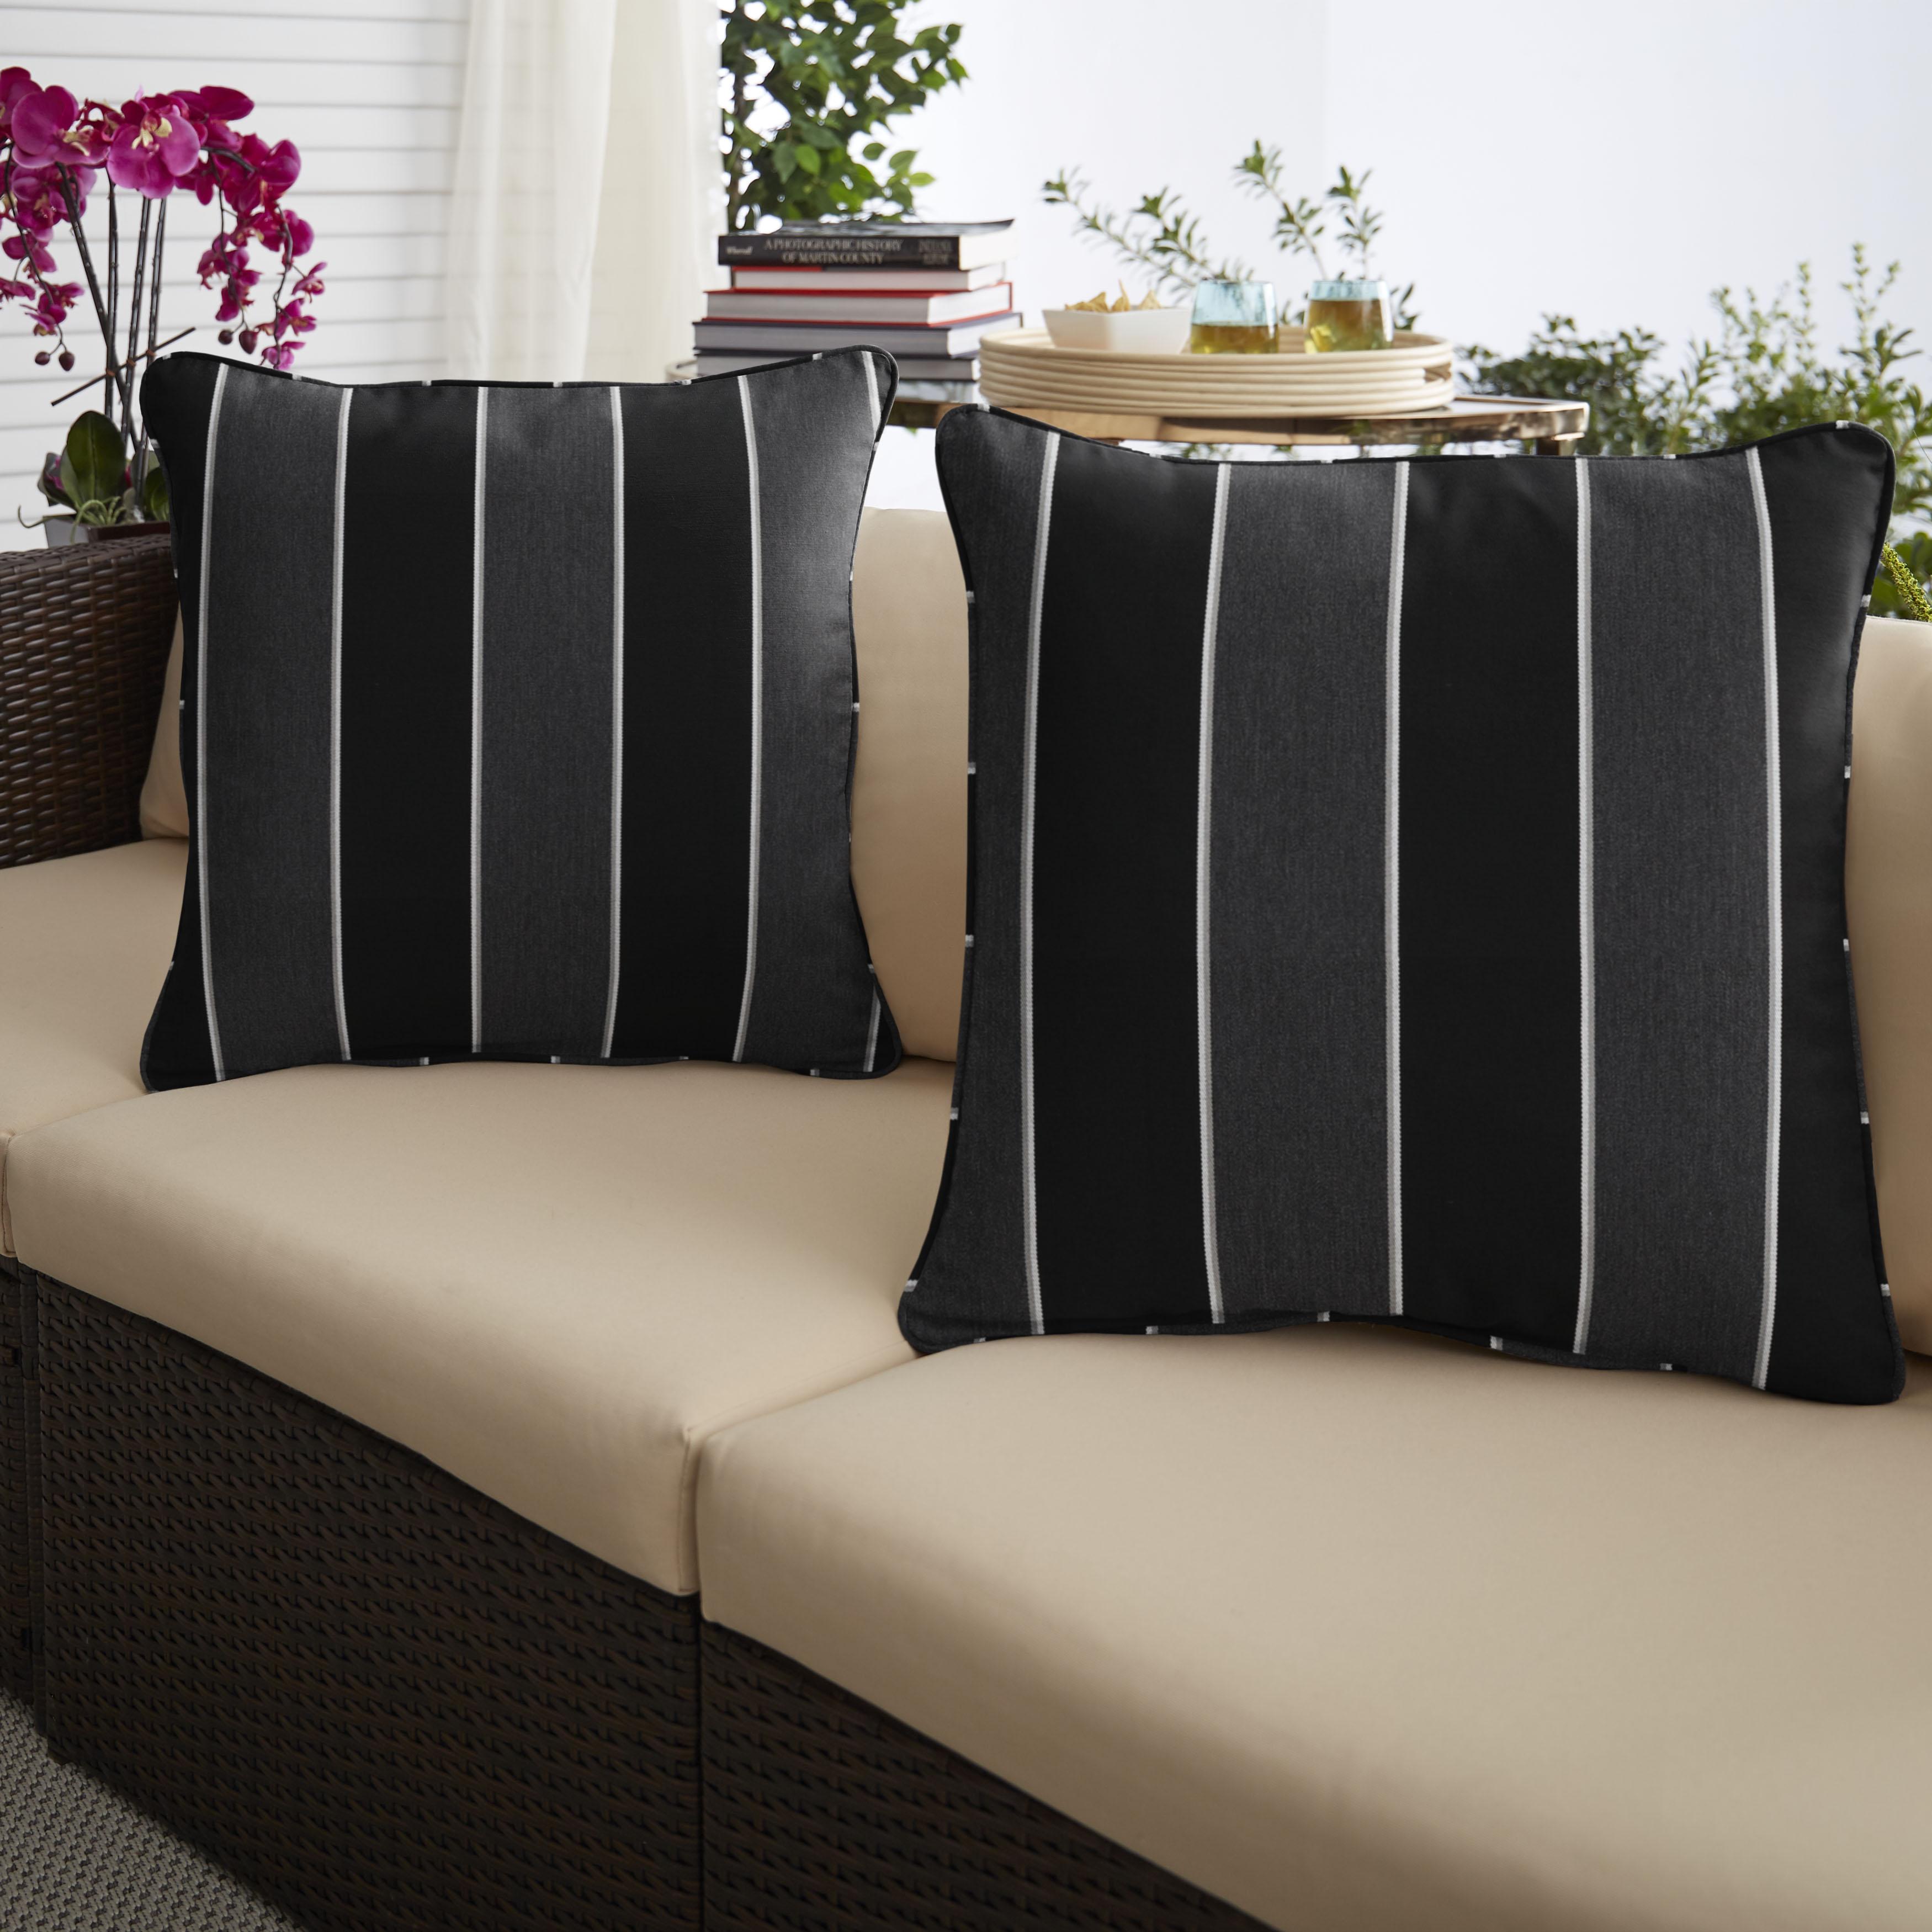 Sunbrella Peyton Granite Set of 2 Outdoor Pillows